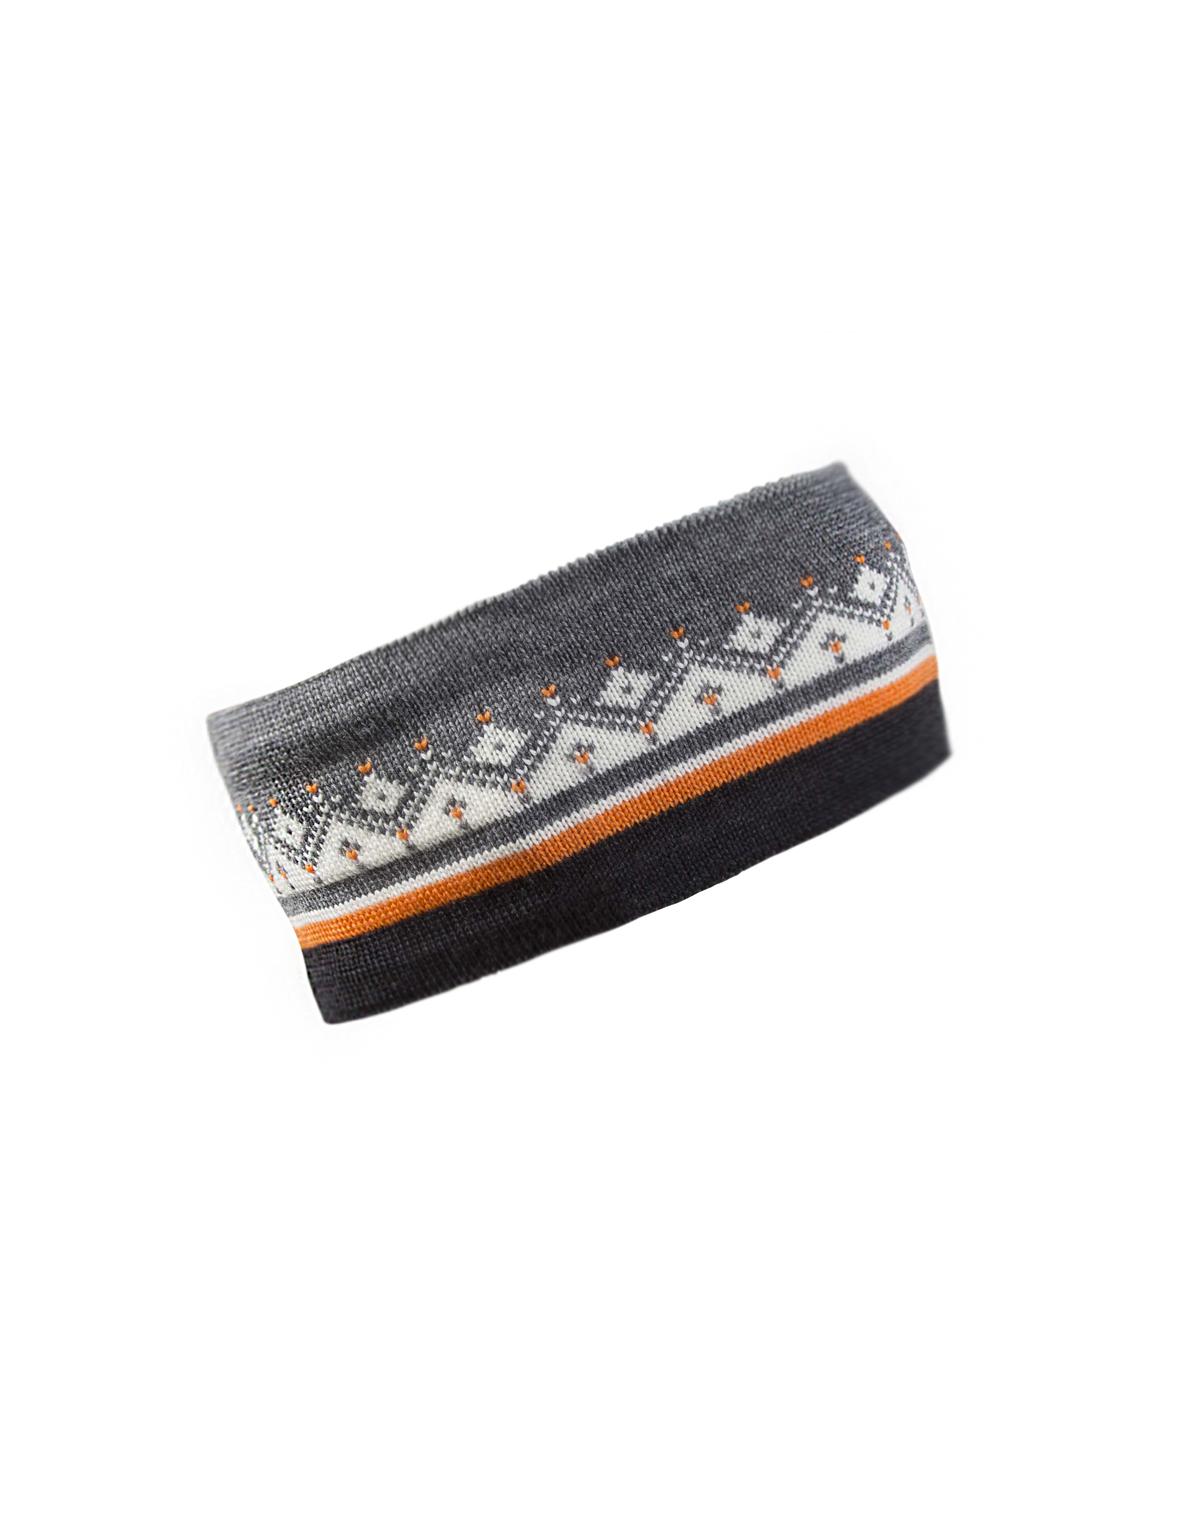 Dark Charcoal / Orange Peel / Off White / Smoke (J)